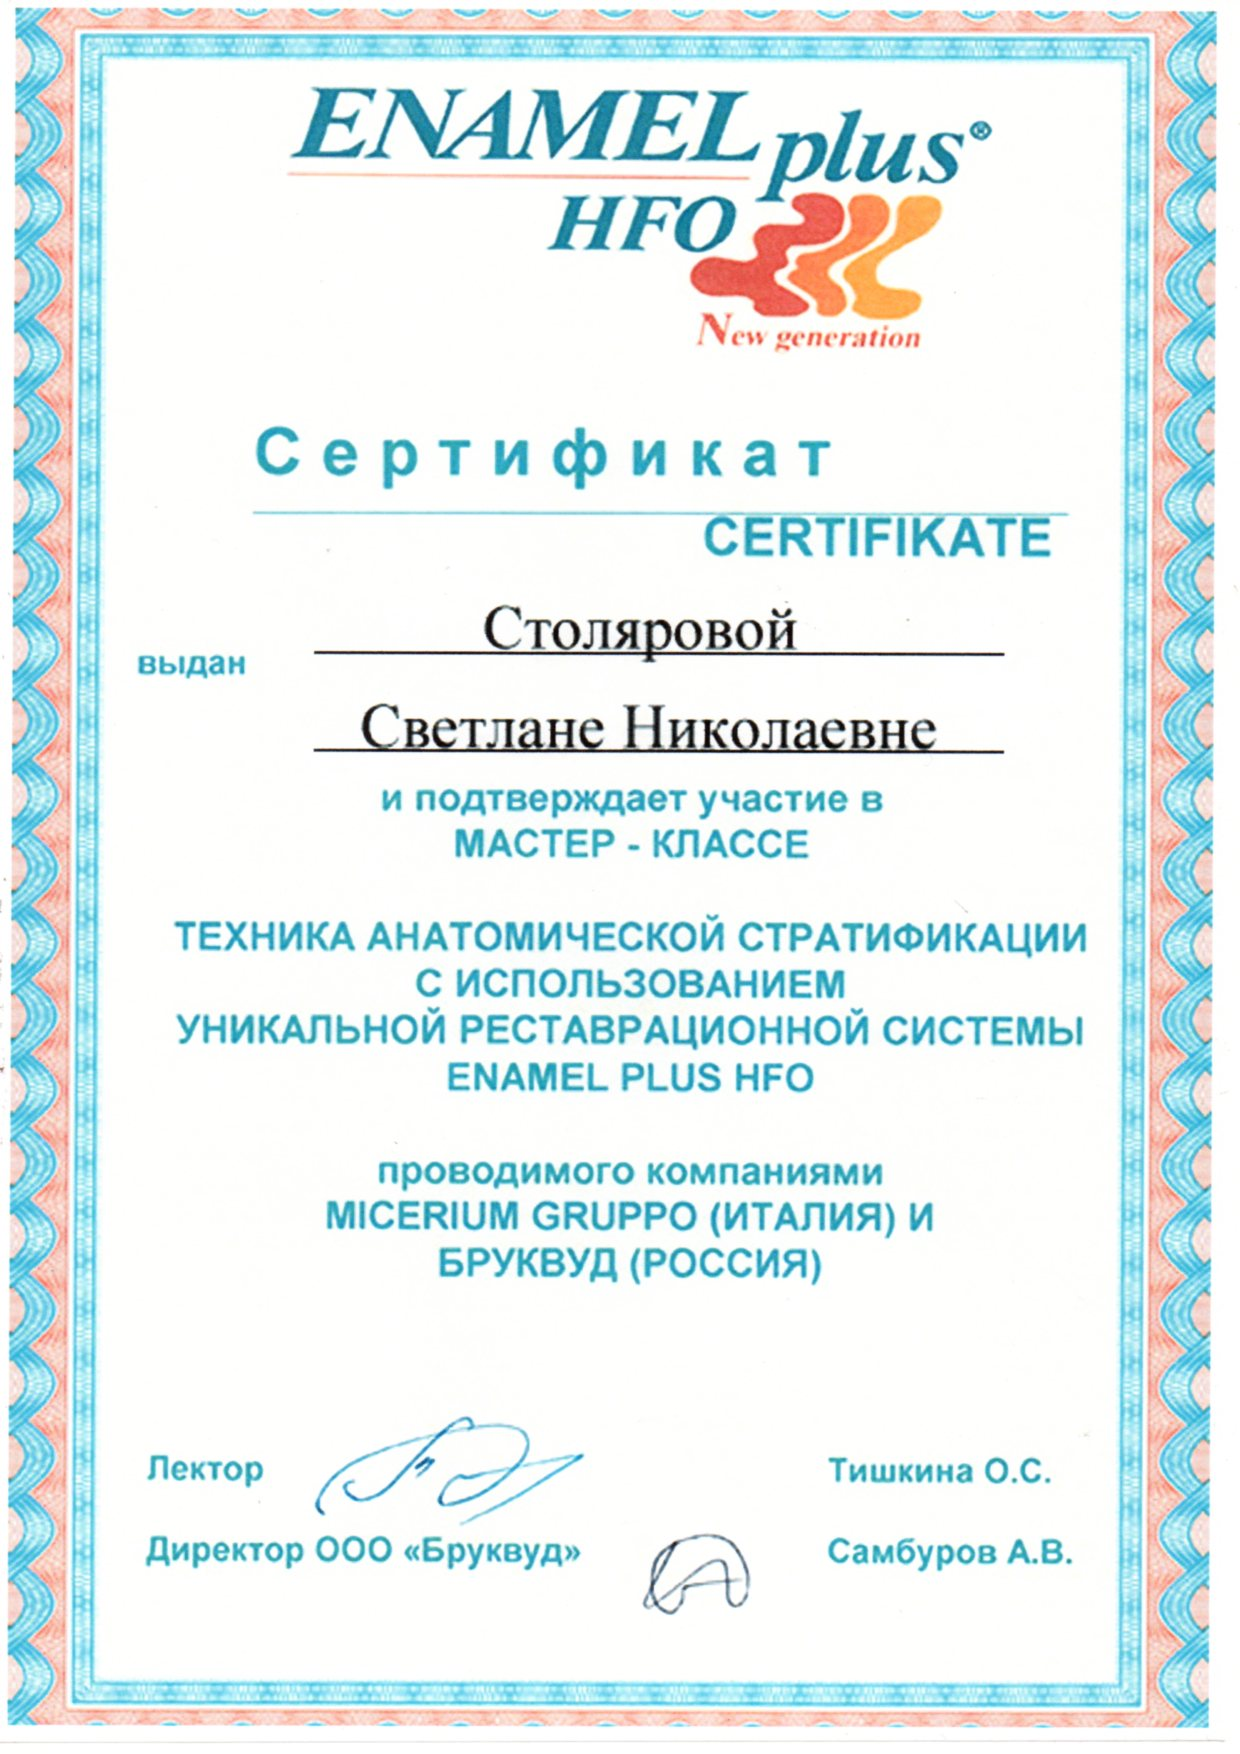 Столярова Светлана Николаевна - Сертификат_09